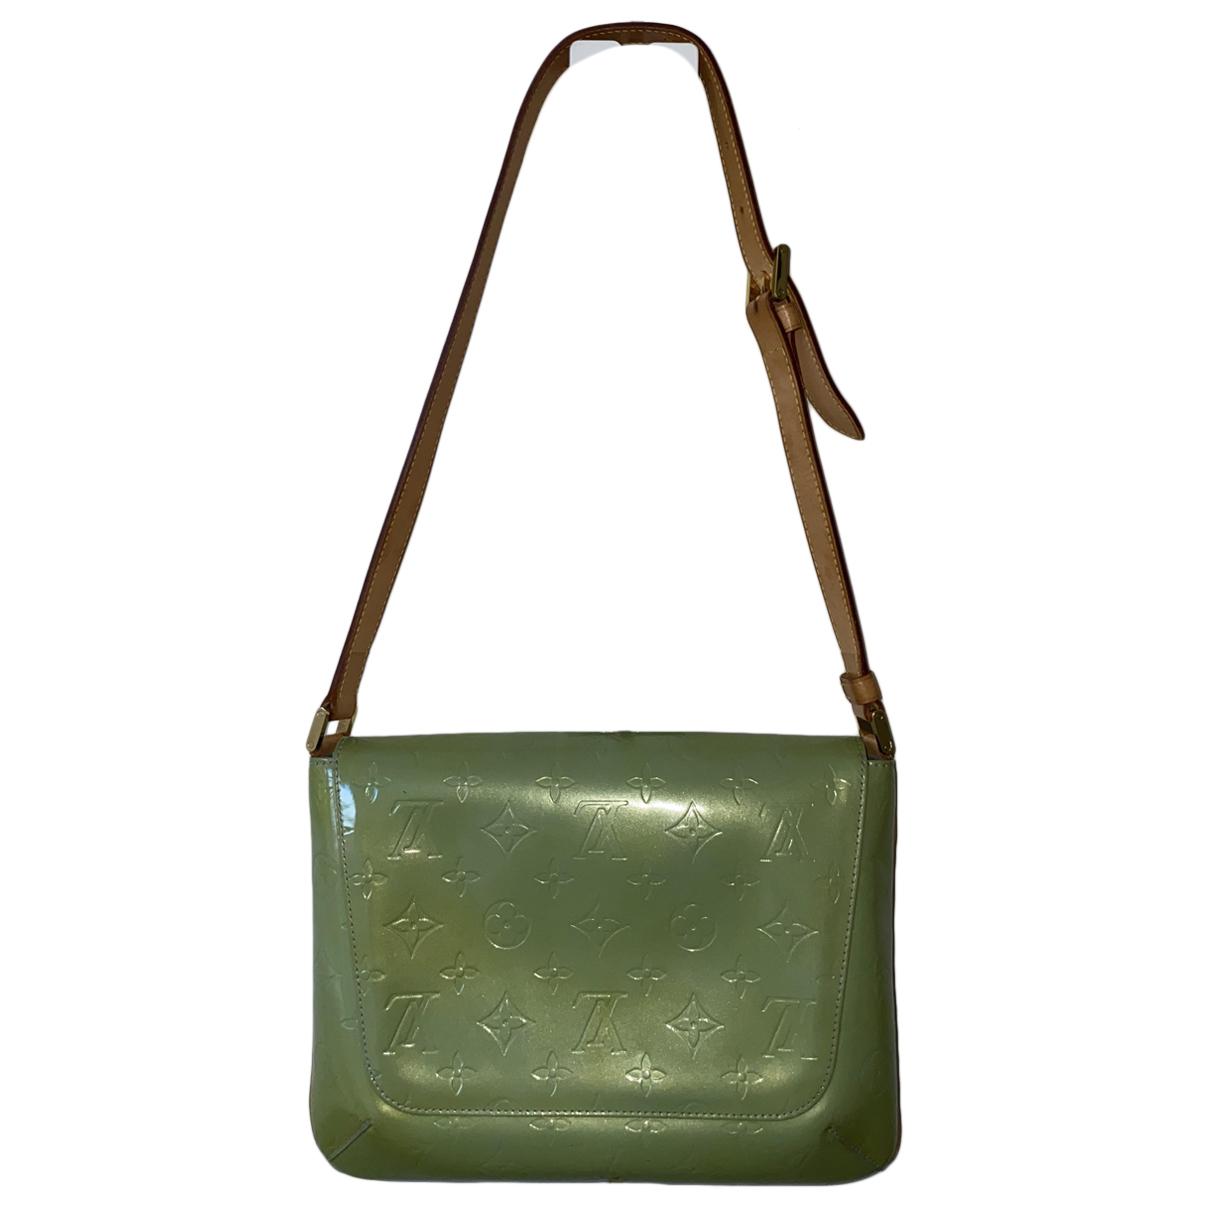 Louis Vuitton - Sac a main Thompson pour femme en cuir verni - vert